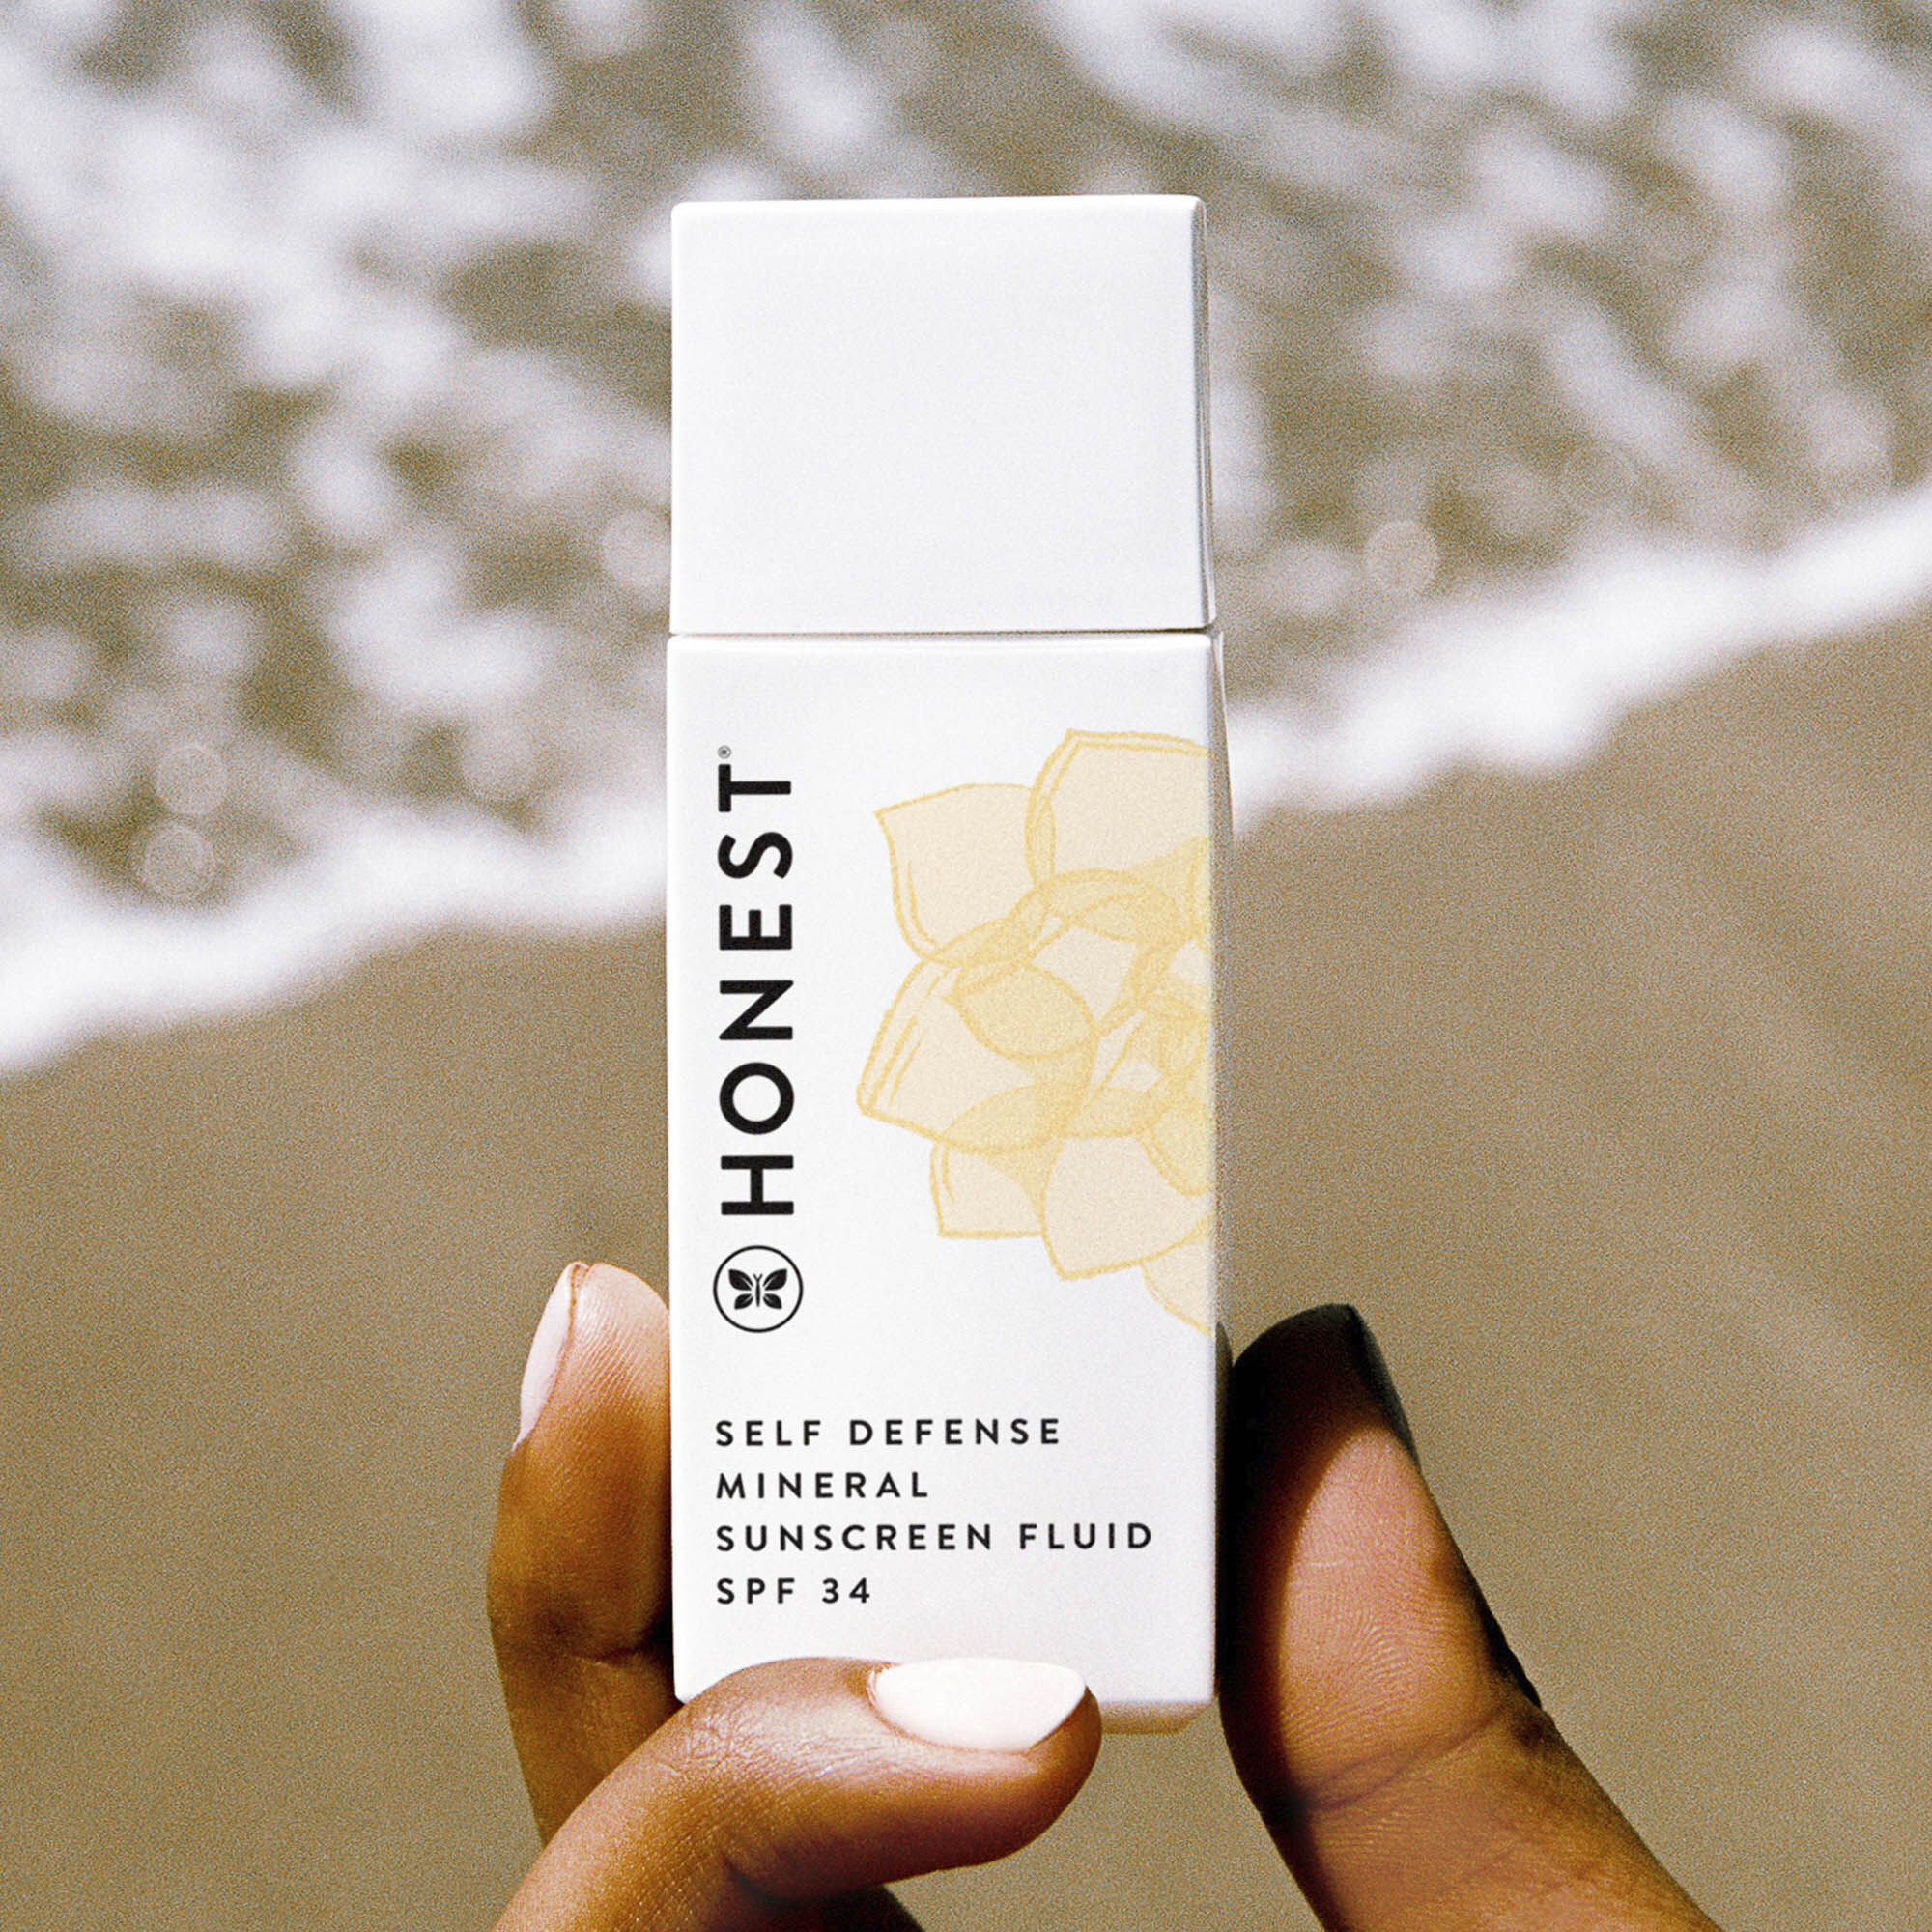 Self Defense Mineral Sunscreen Fluid SPF 34